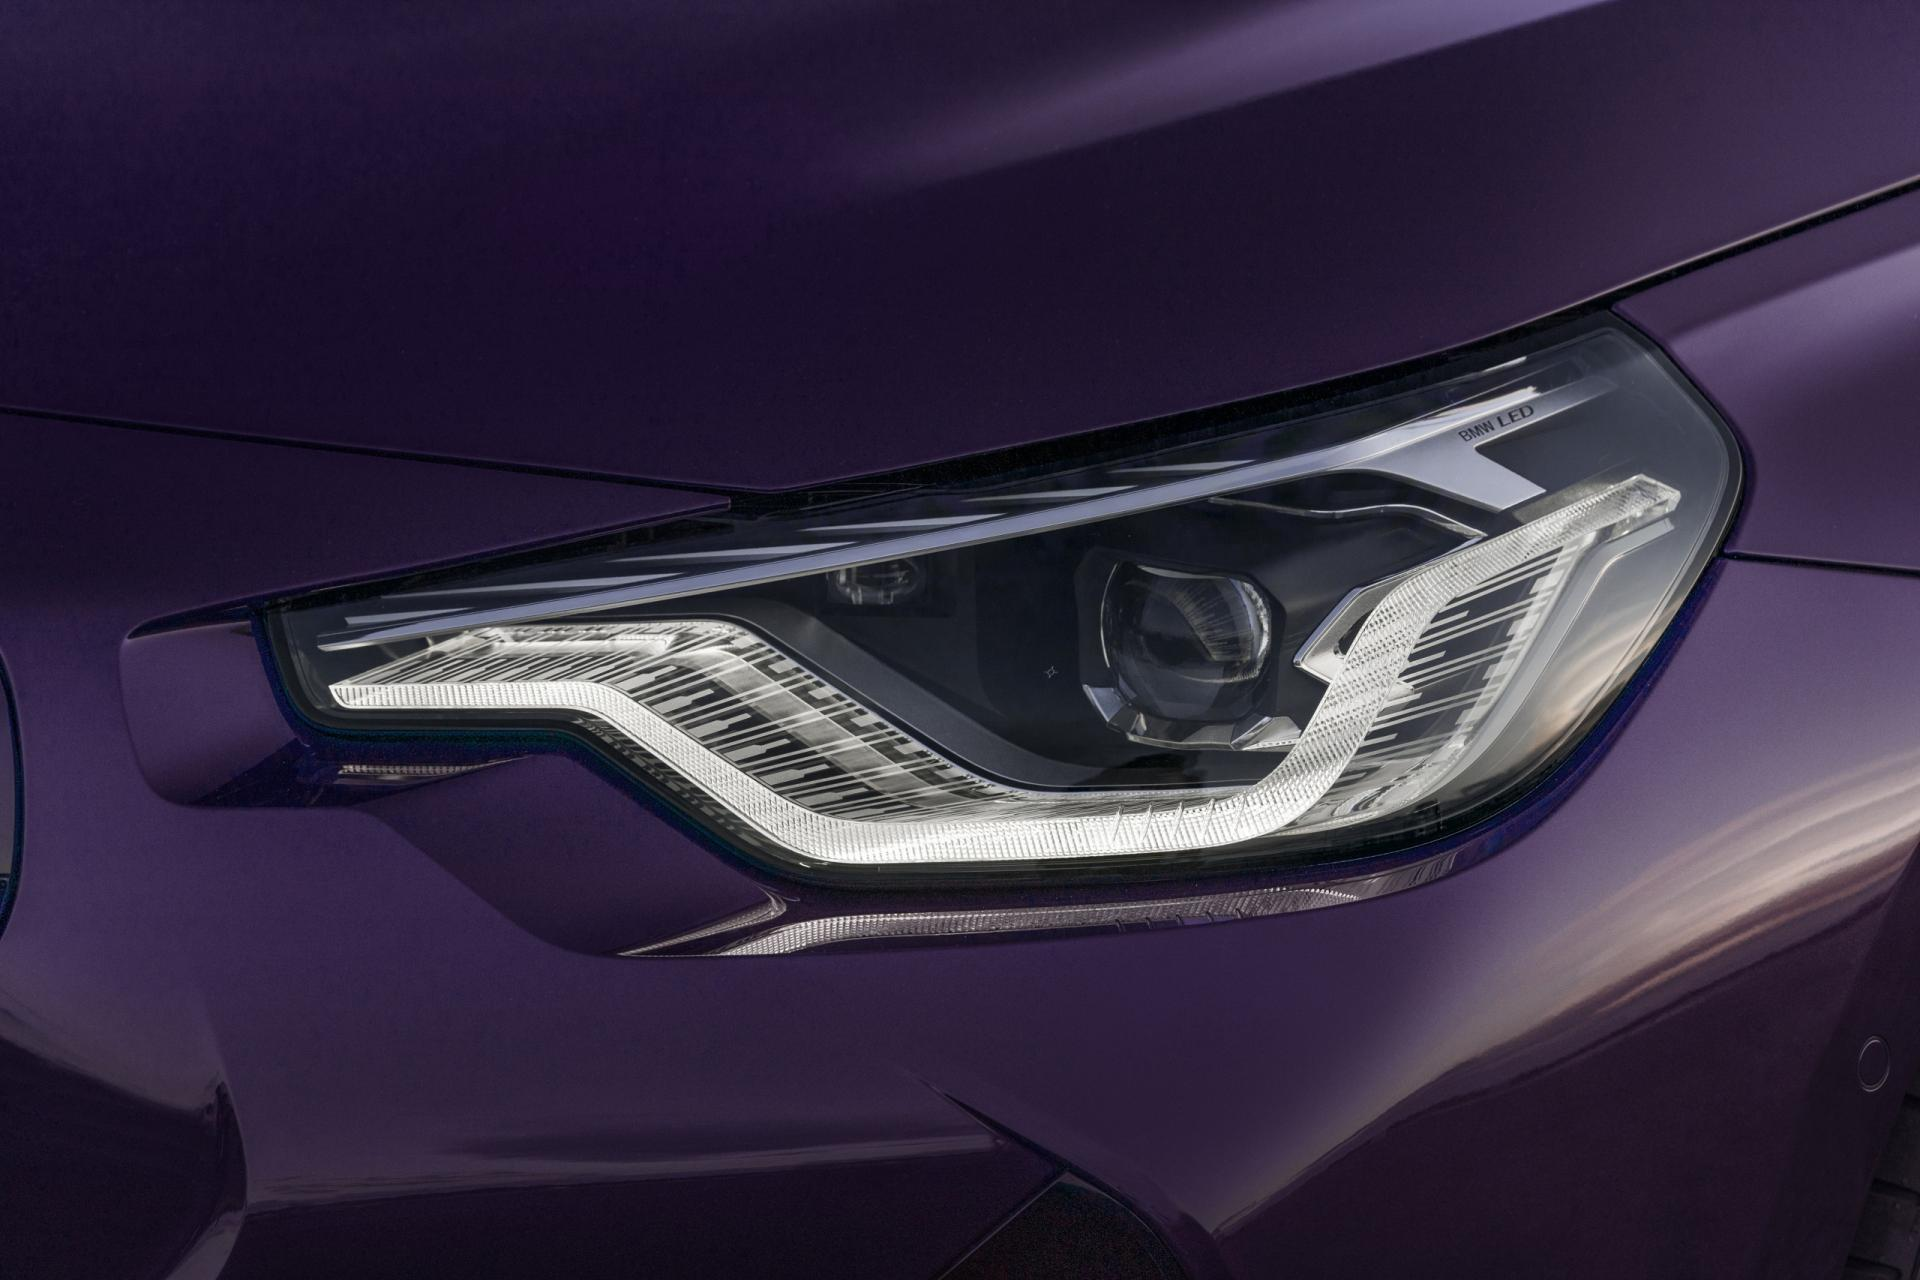 New BMW 2 Series headlights